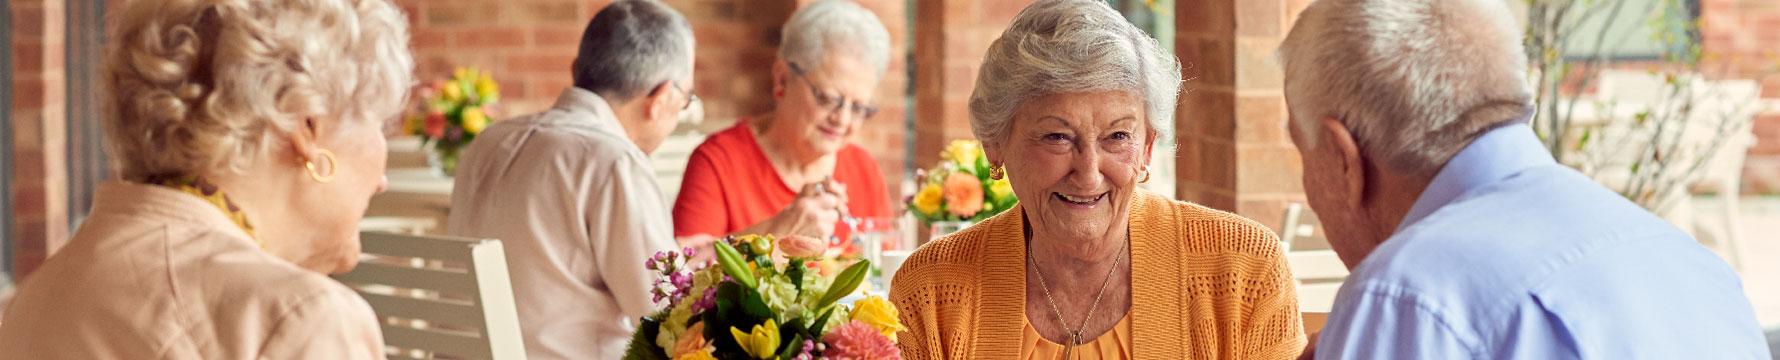 Three Beacon Hill senior living community residents sitting outside enjoying a meal